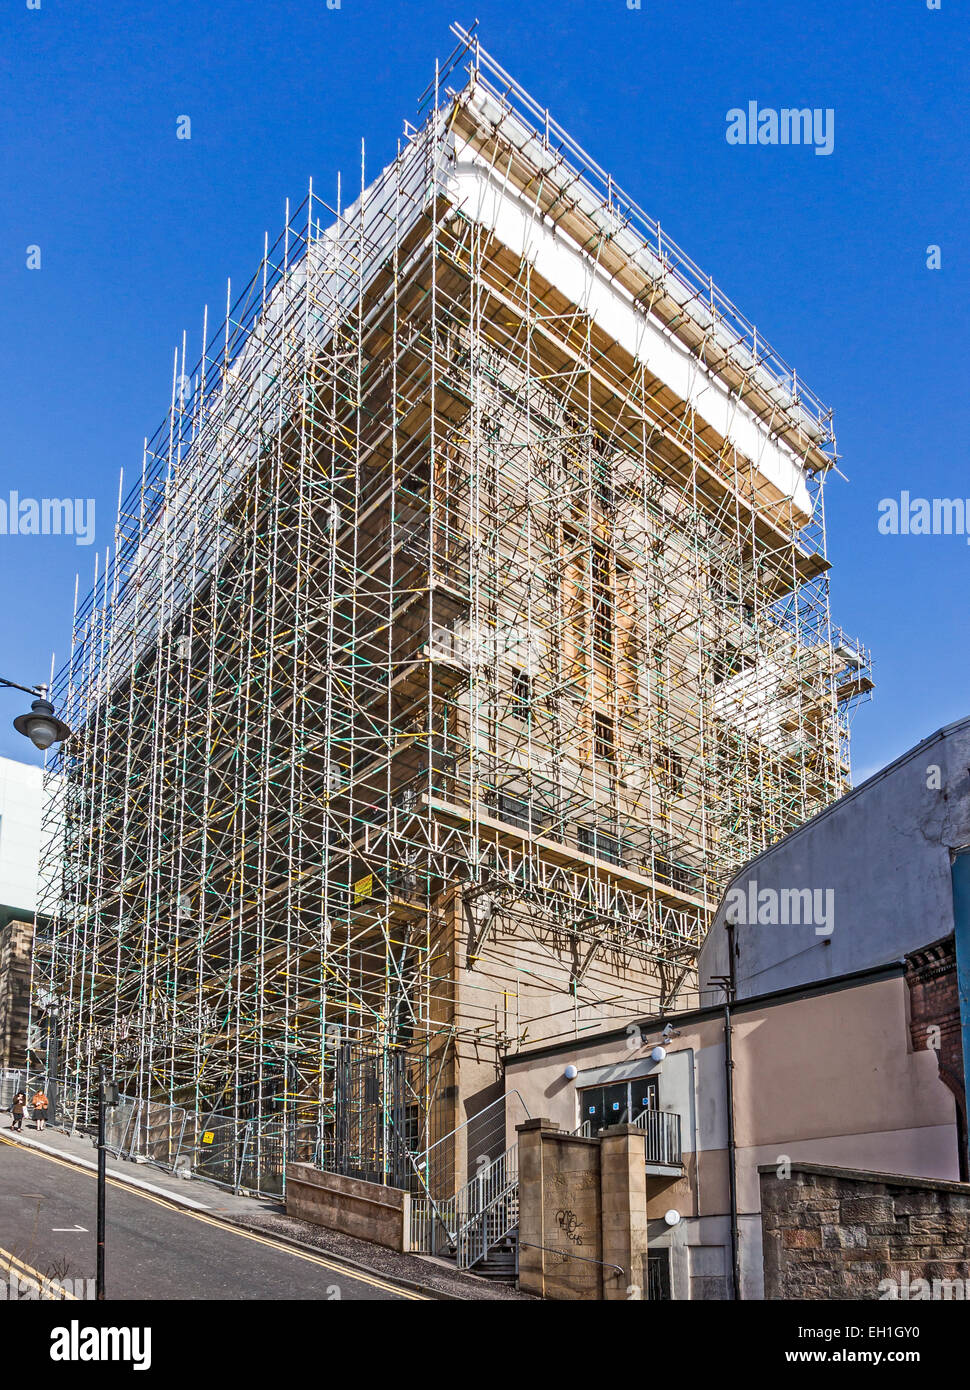 Scaffolding on the Glasgow School of Art building in Renfrew Street Glasgow Scotland btween the two fires - Stock Image